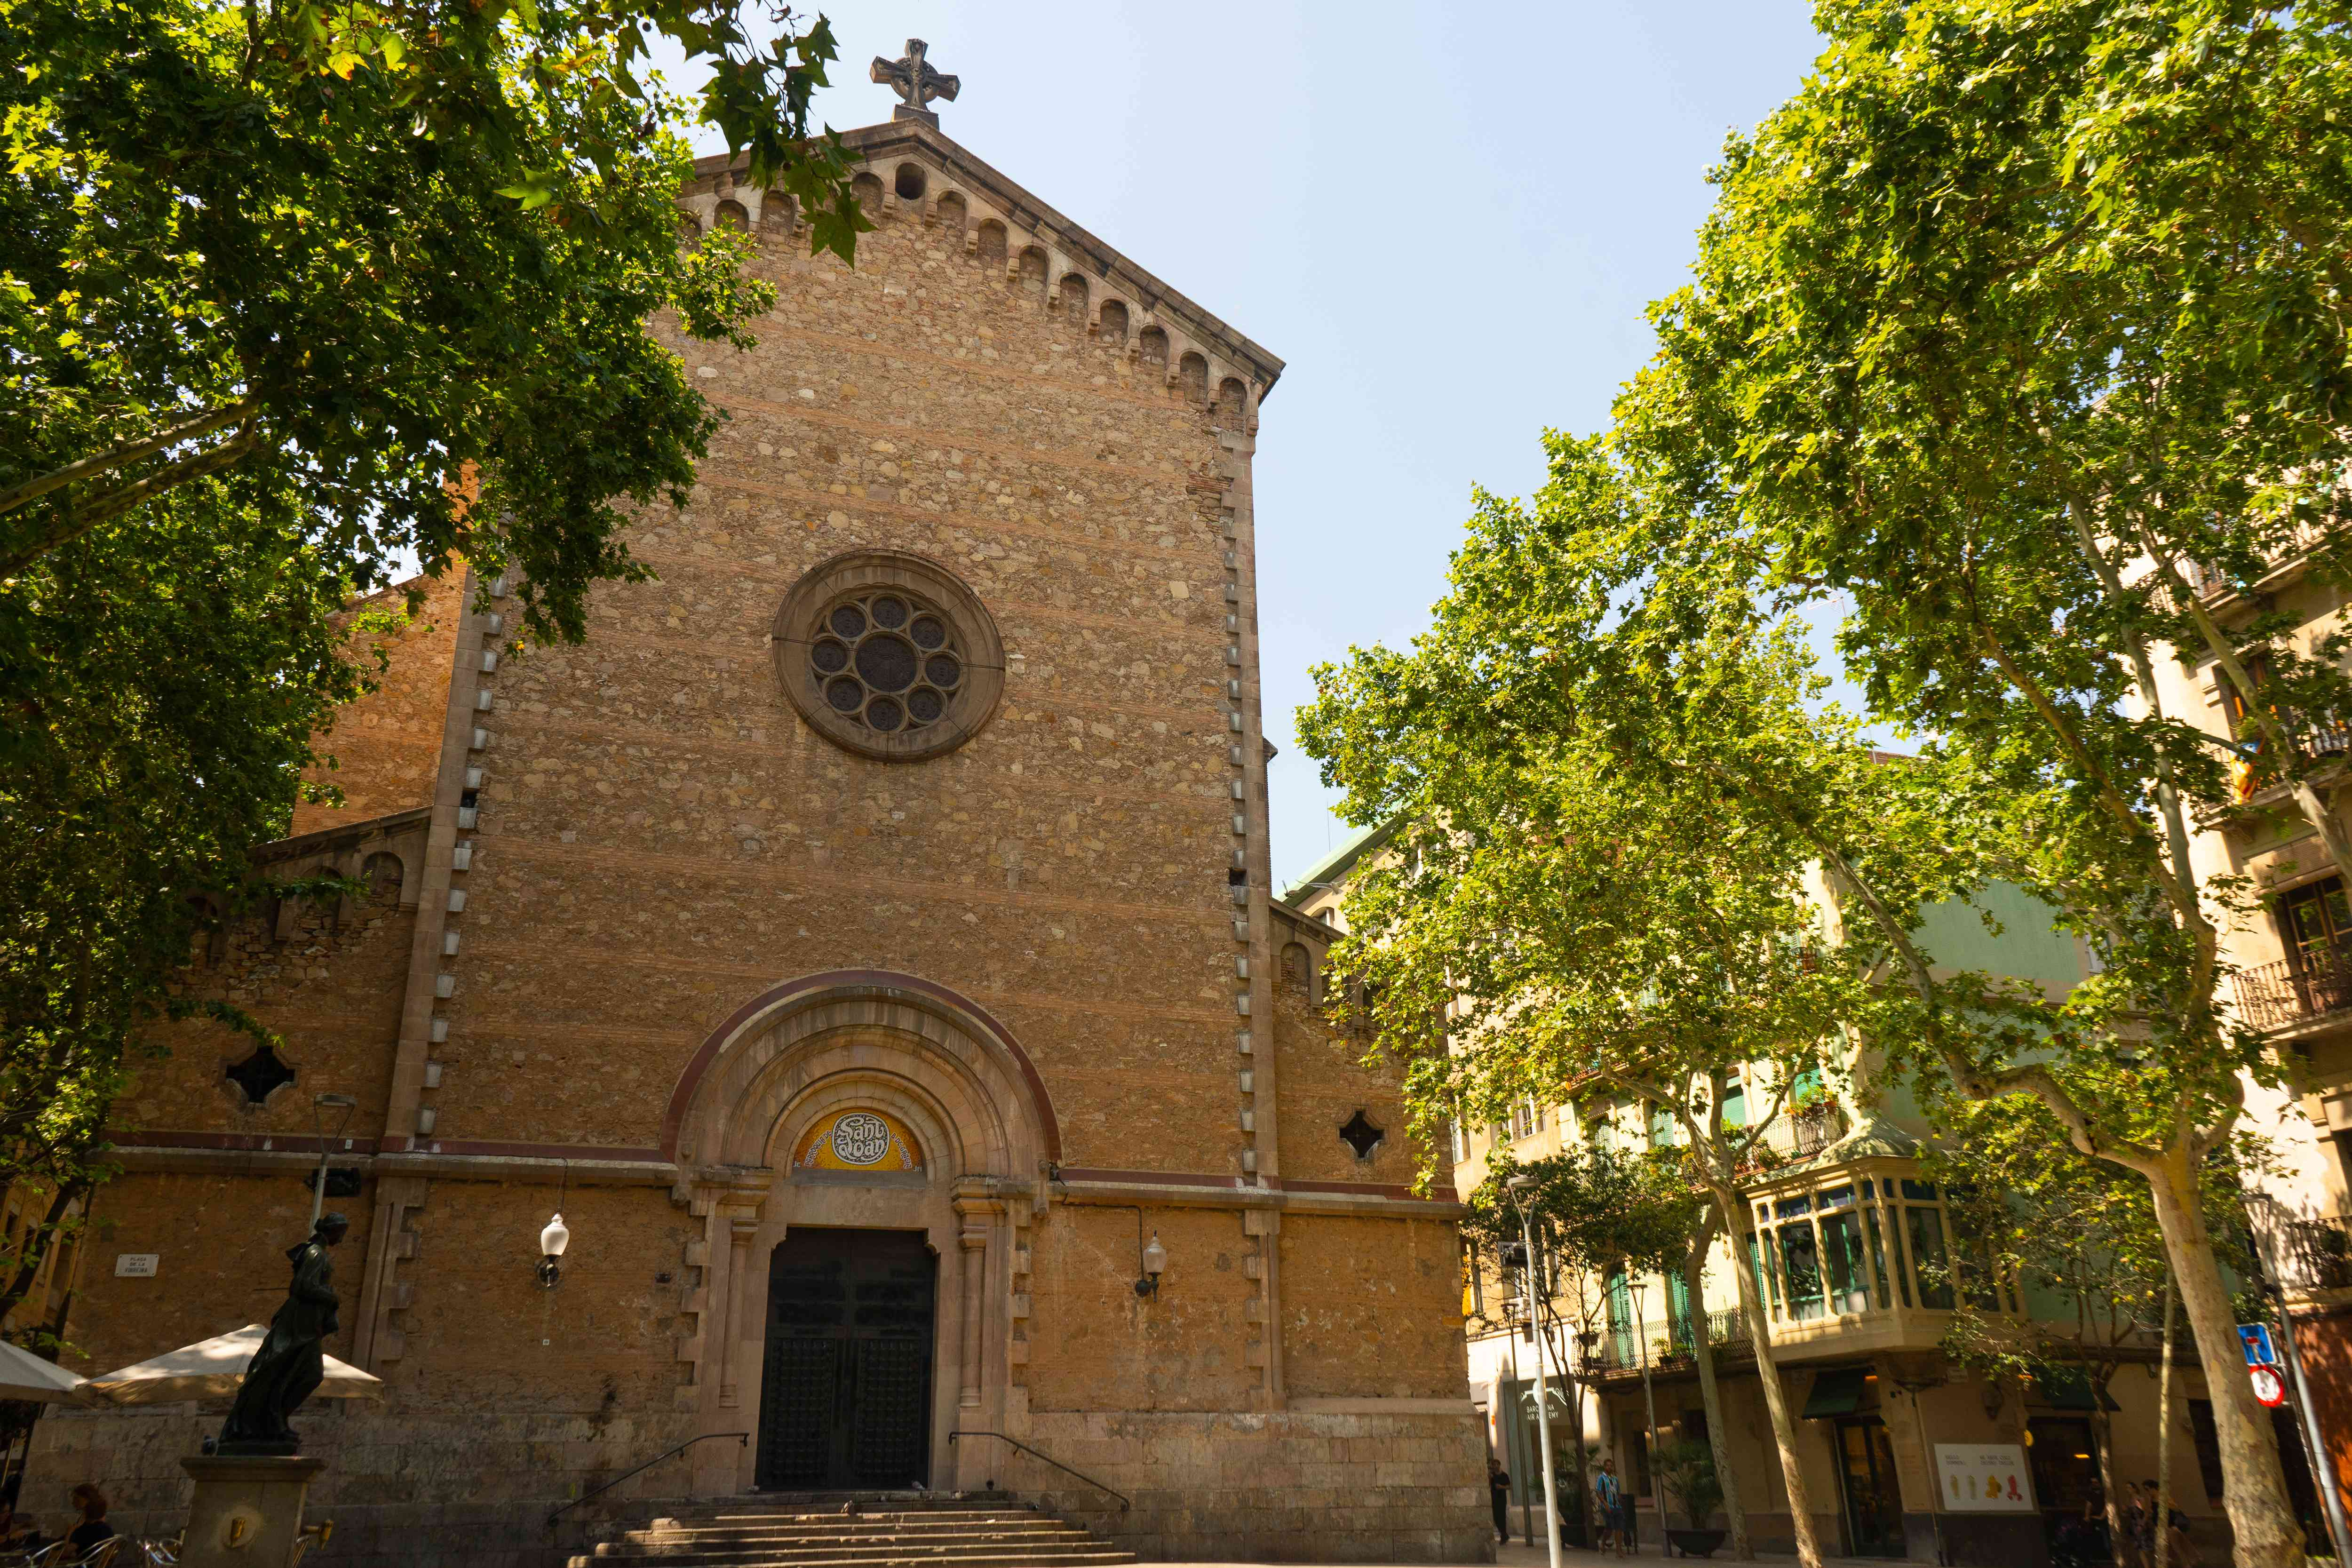 Plaça de la Virreina in Barcelona